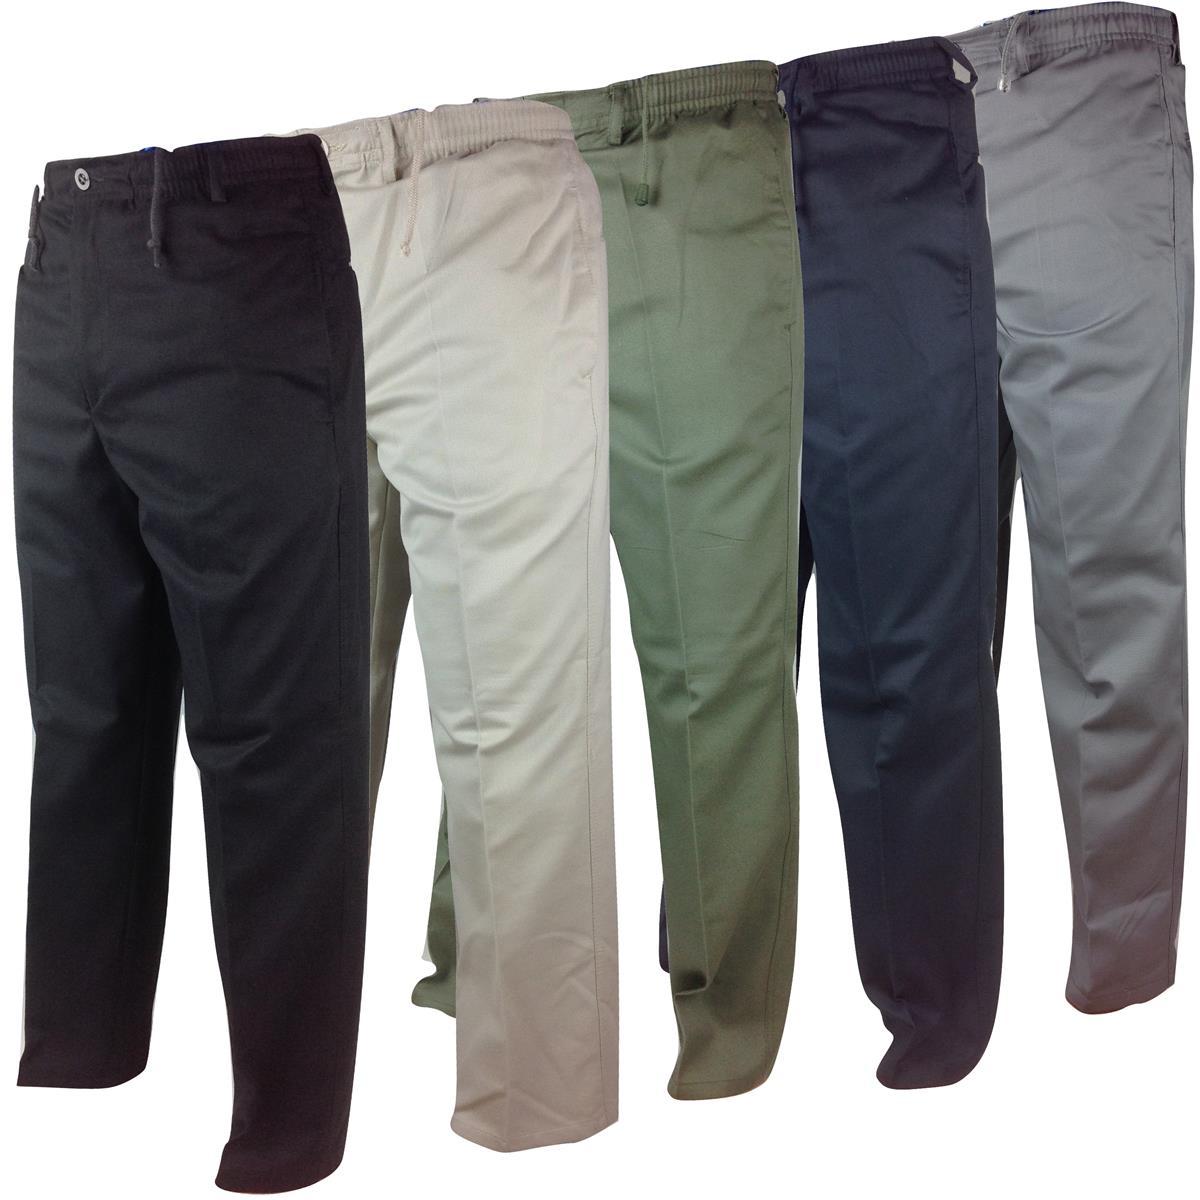 women jeans for si jeggings comforter comfortable shiyara pants stretchable